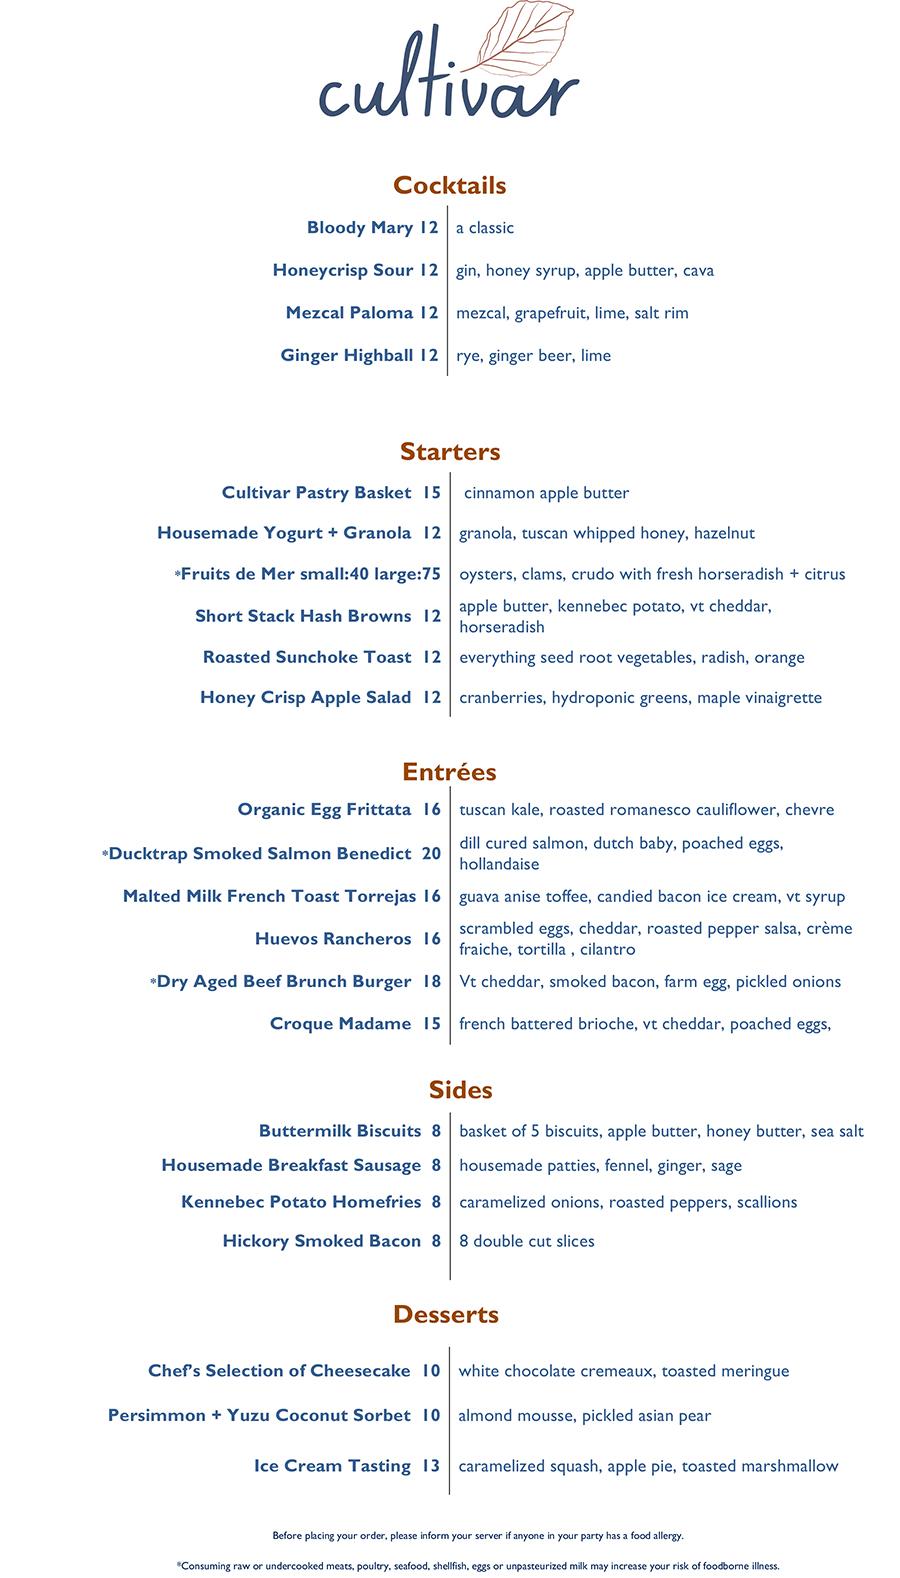 Cultivar brunch menu